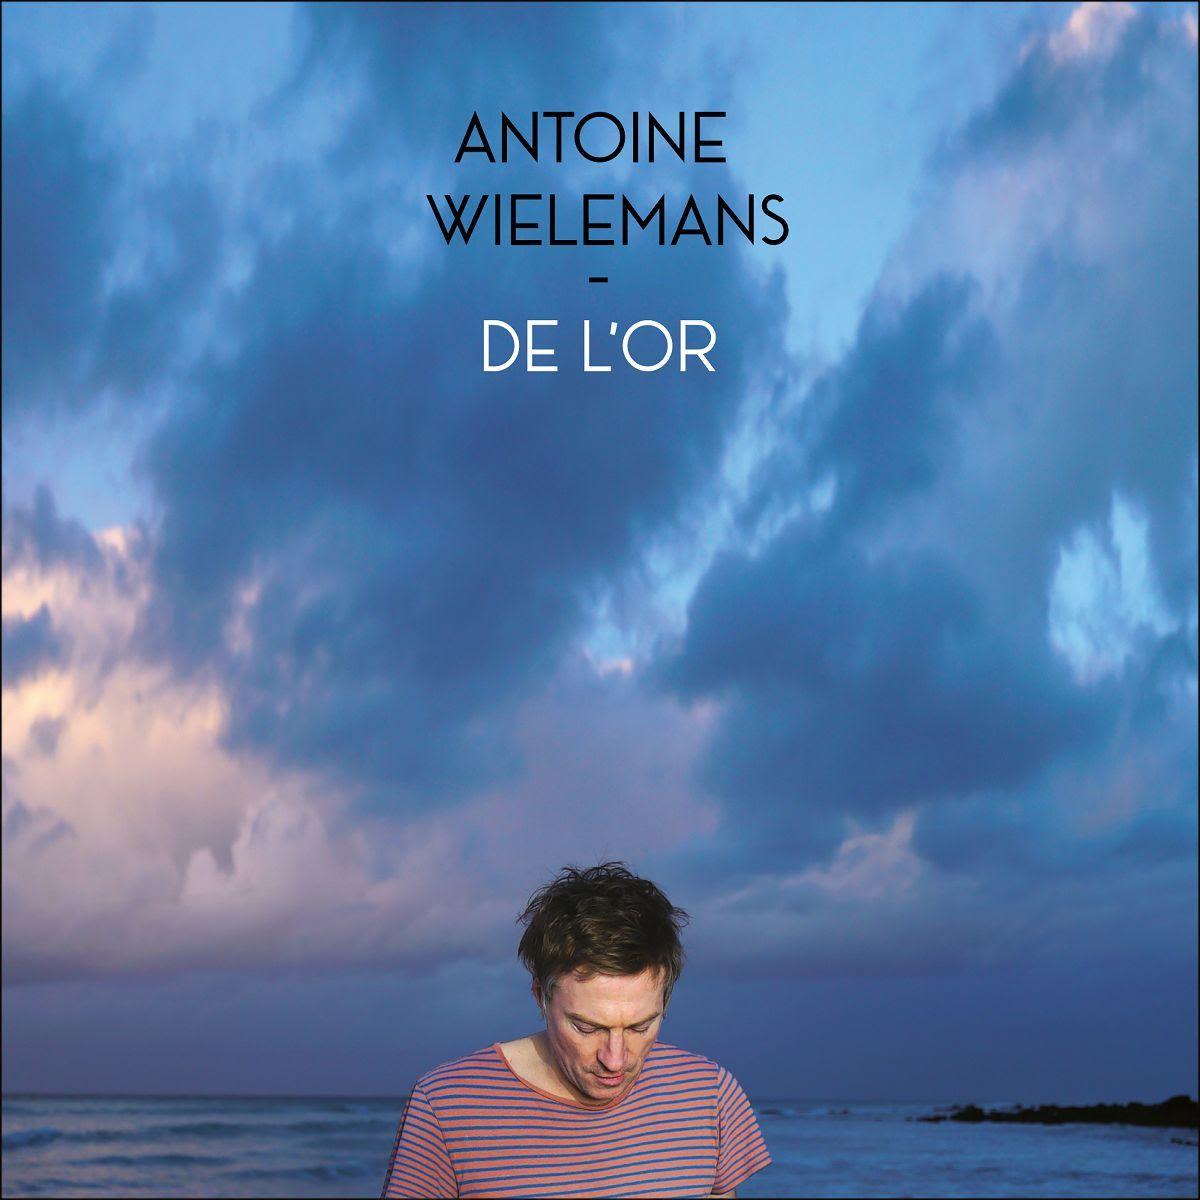 Antoine Wielemans - De L'or